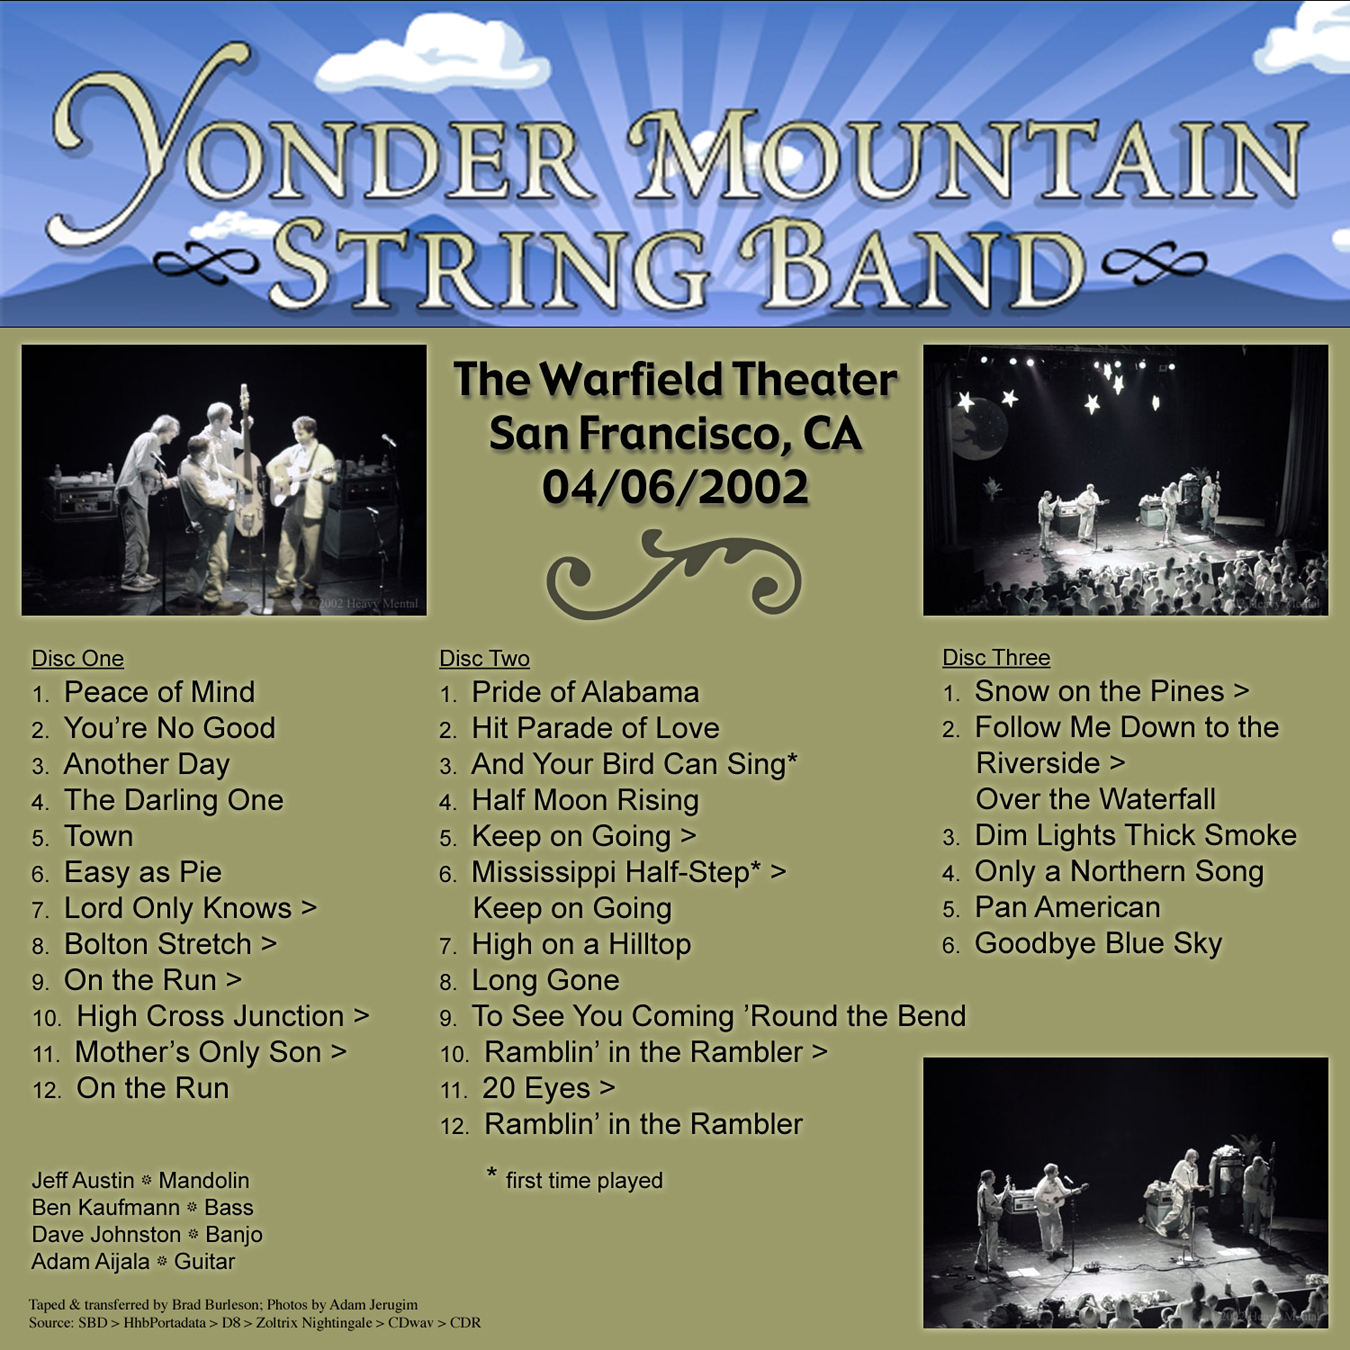 YonderMountainStringBand2002-04-06WarfieldTheaterSanFranciscoCA.jpg